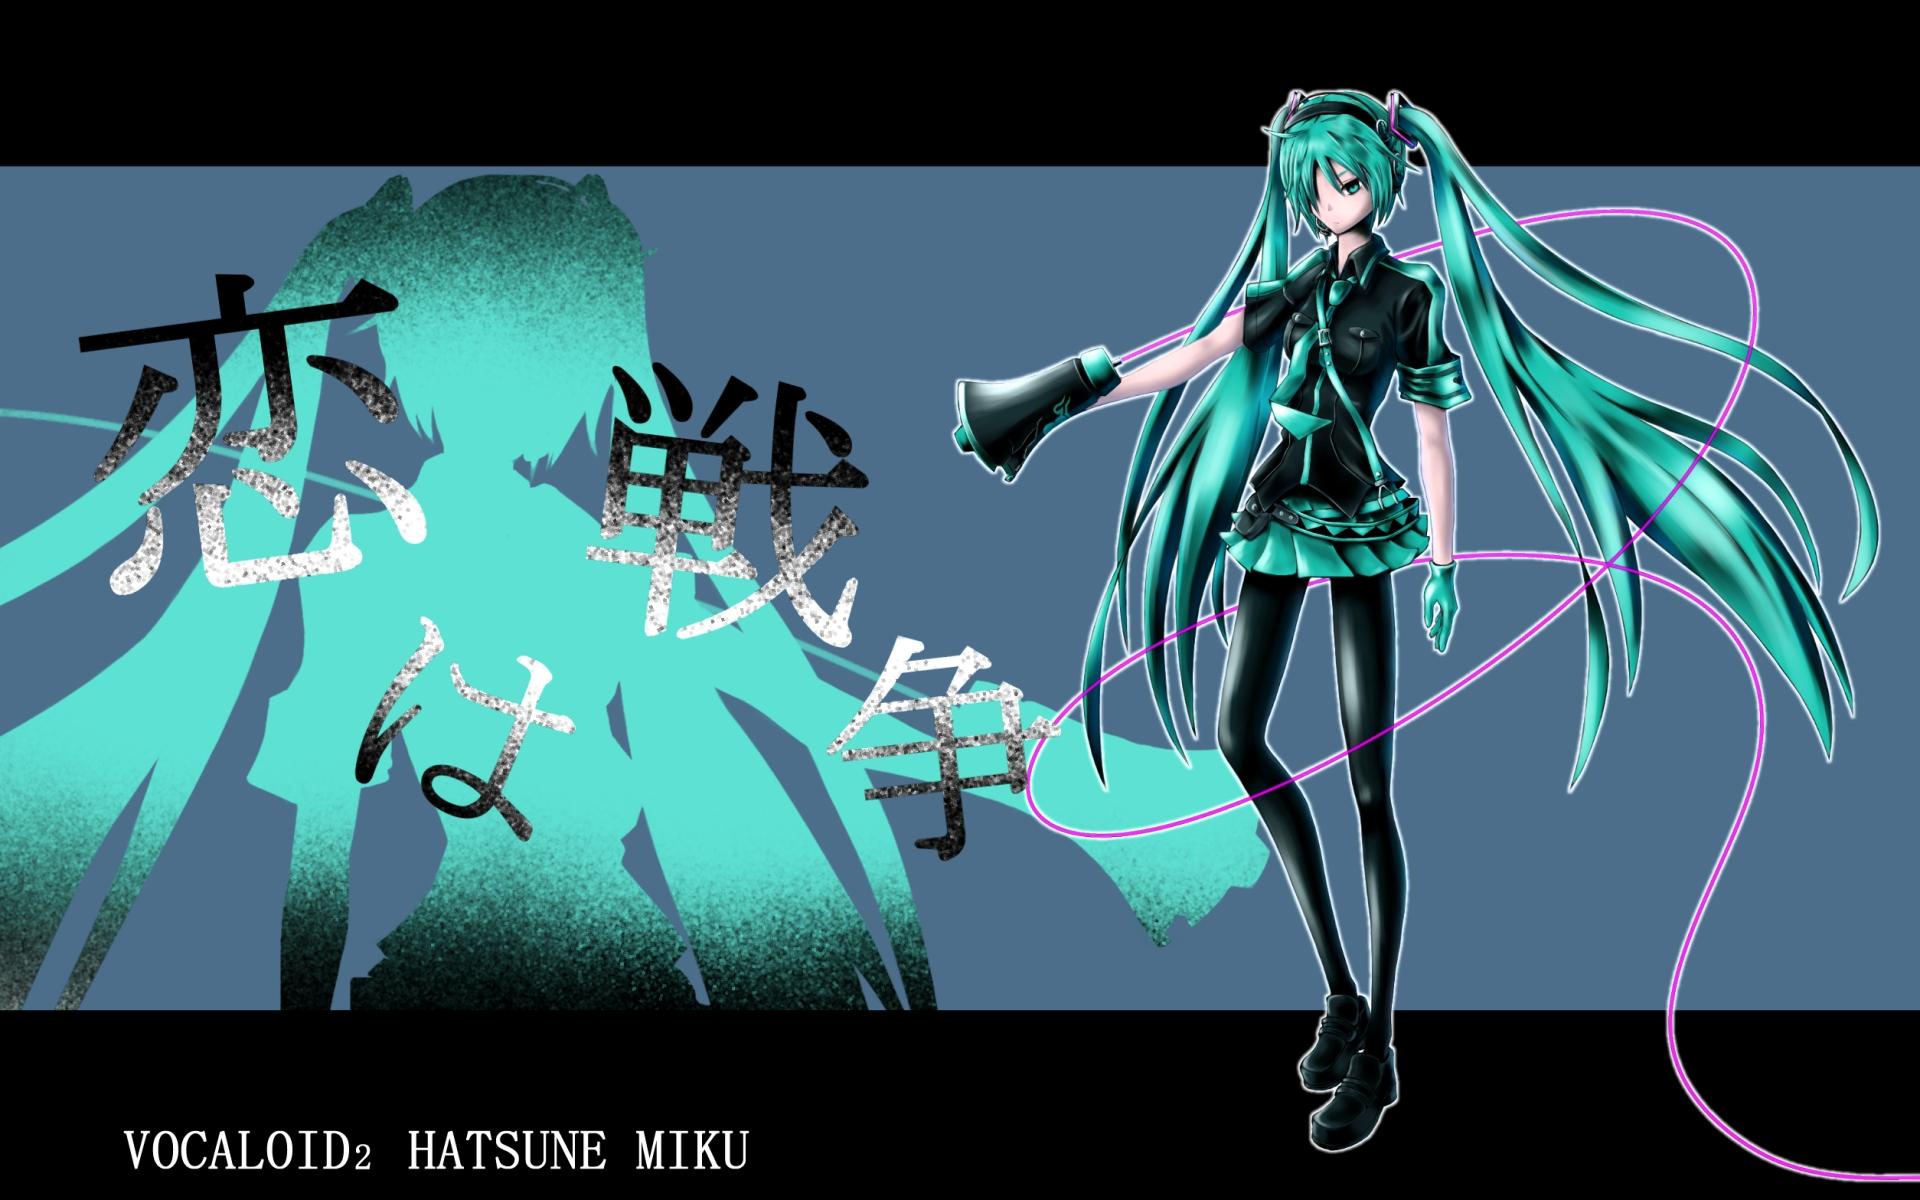 hatsune_miku koi_wa_sensou_(vocaloid) twintails vocaloid